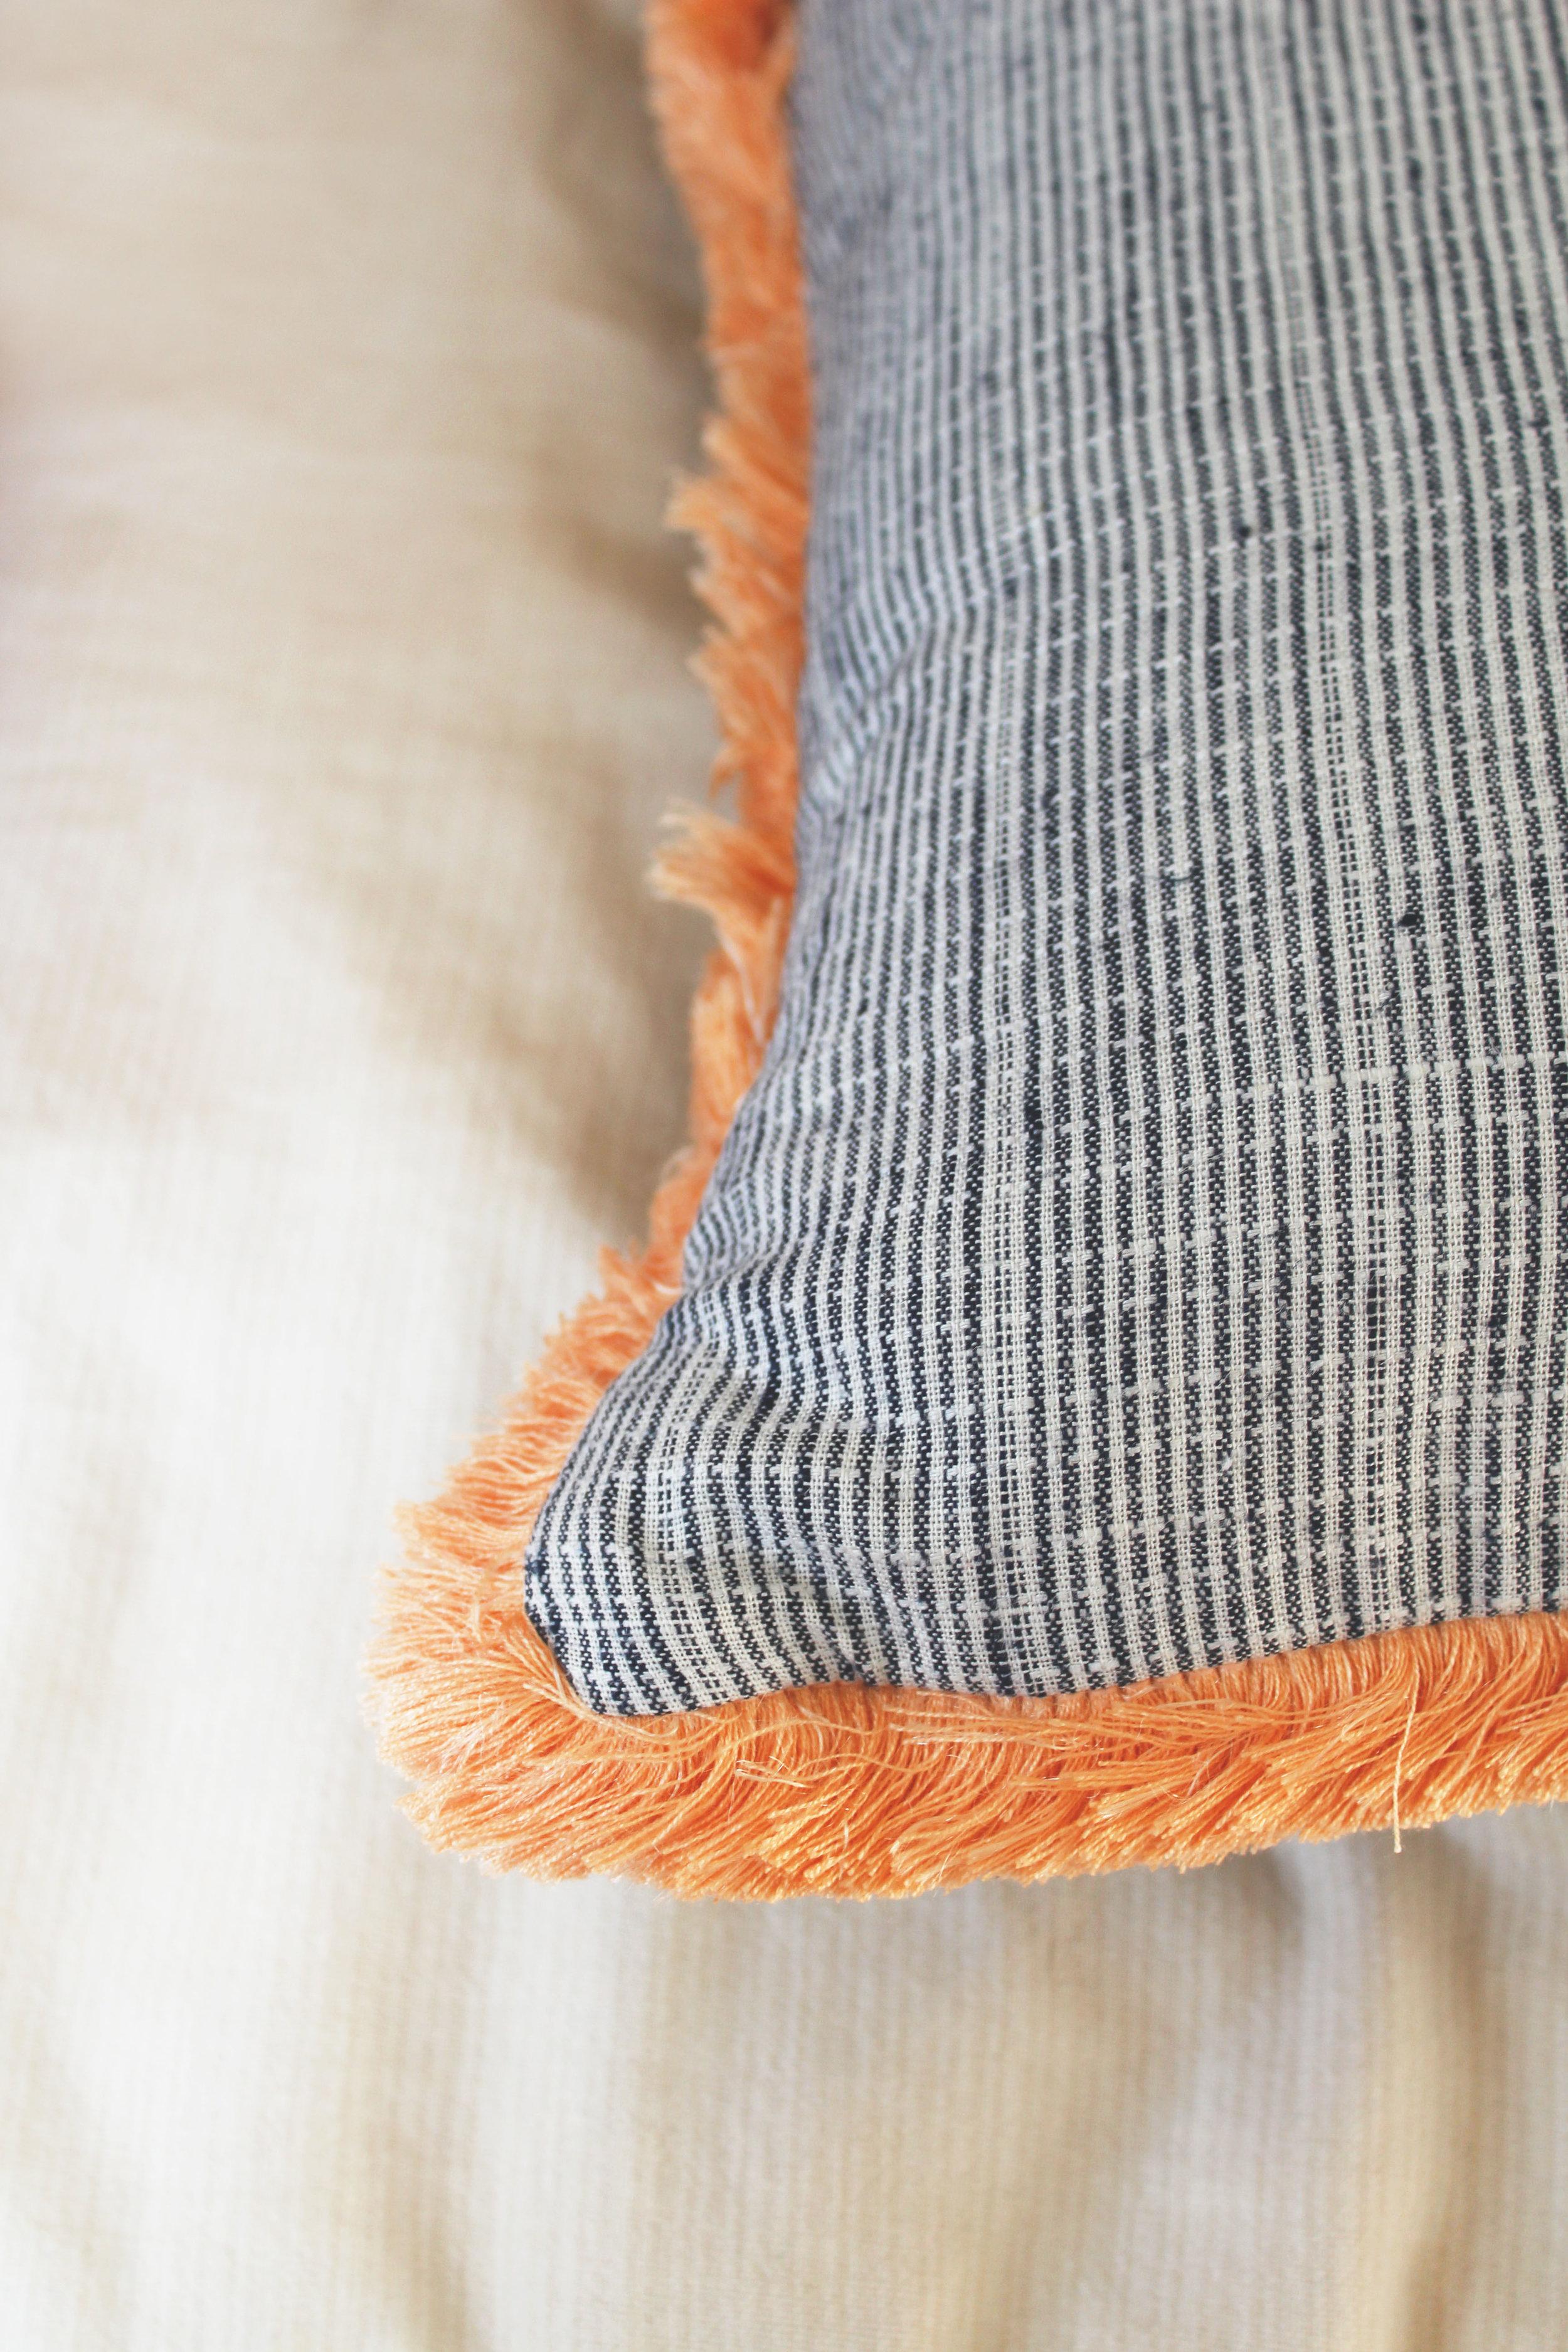 Fringe pillow by Calhoun & Co. Boho Home decor ideas